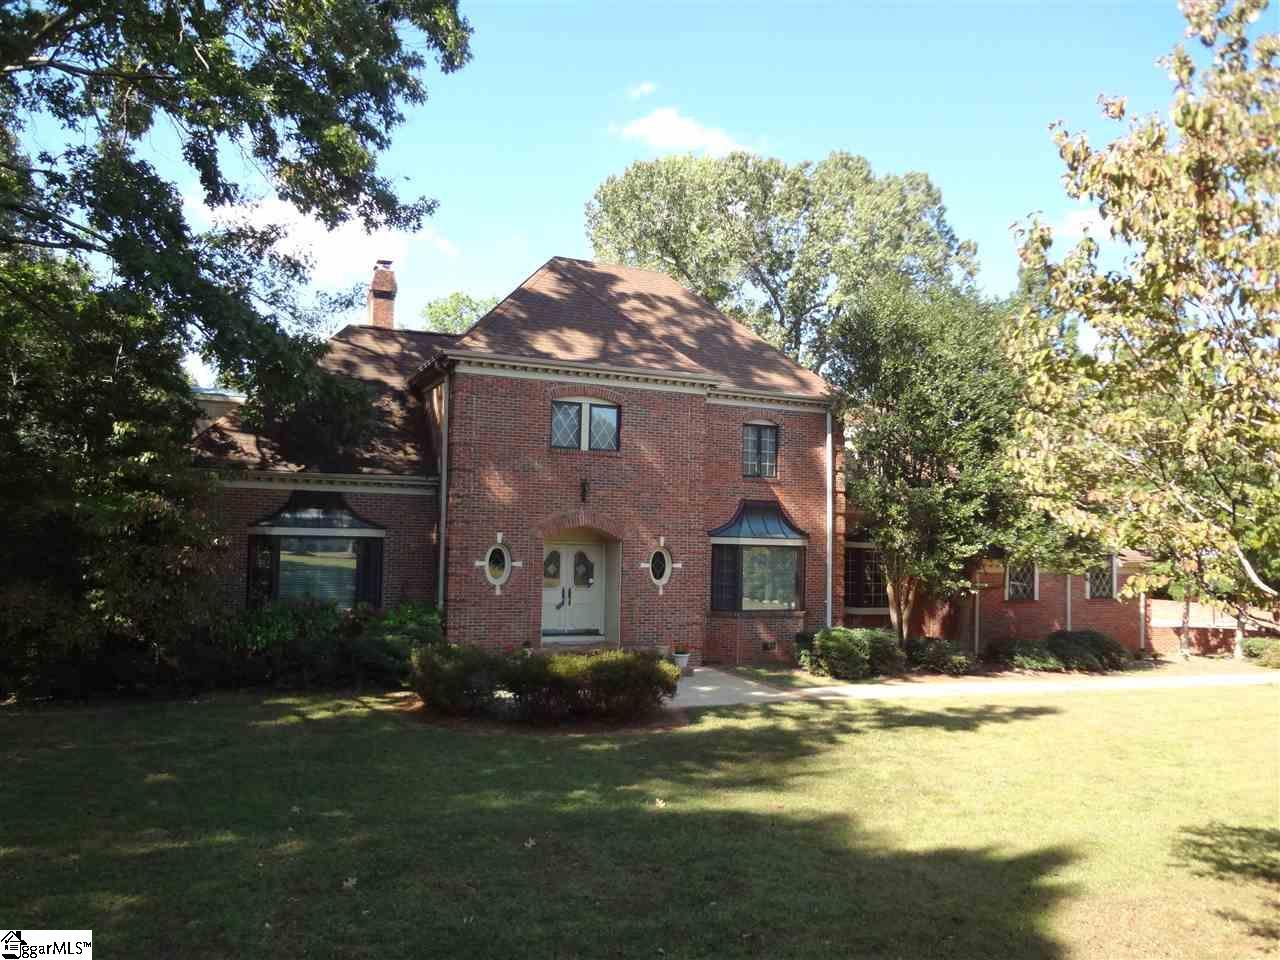 105 W Round Hill Greenville, SC 29617-7039